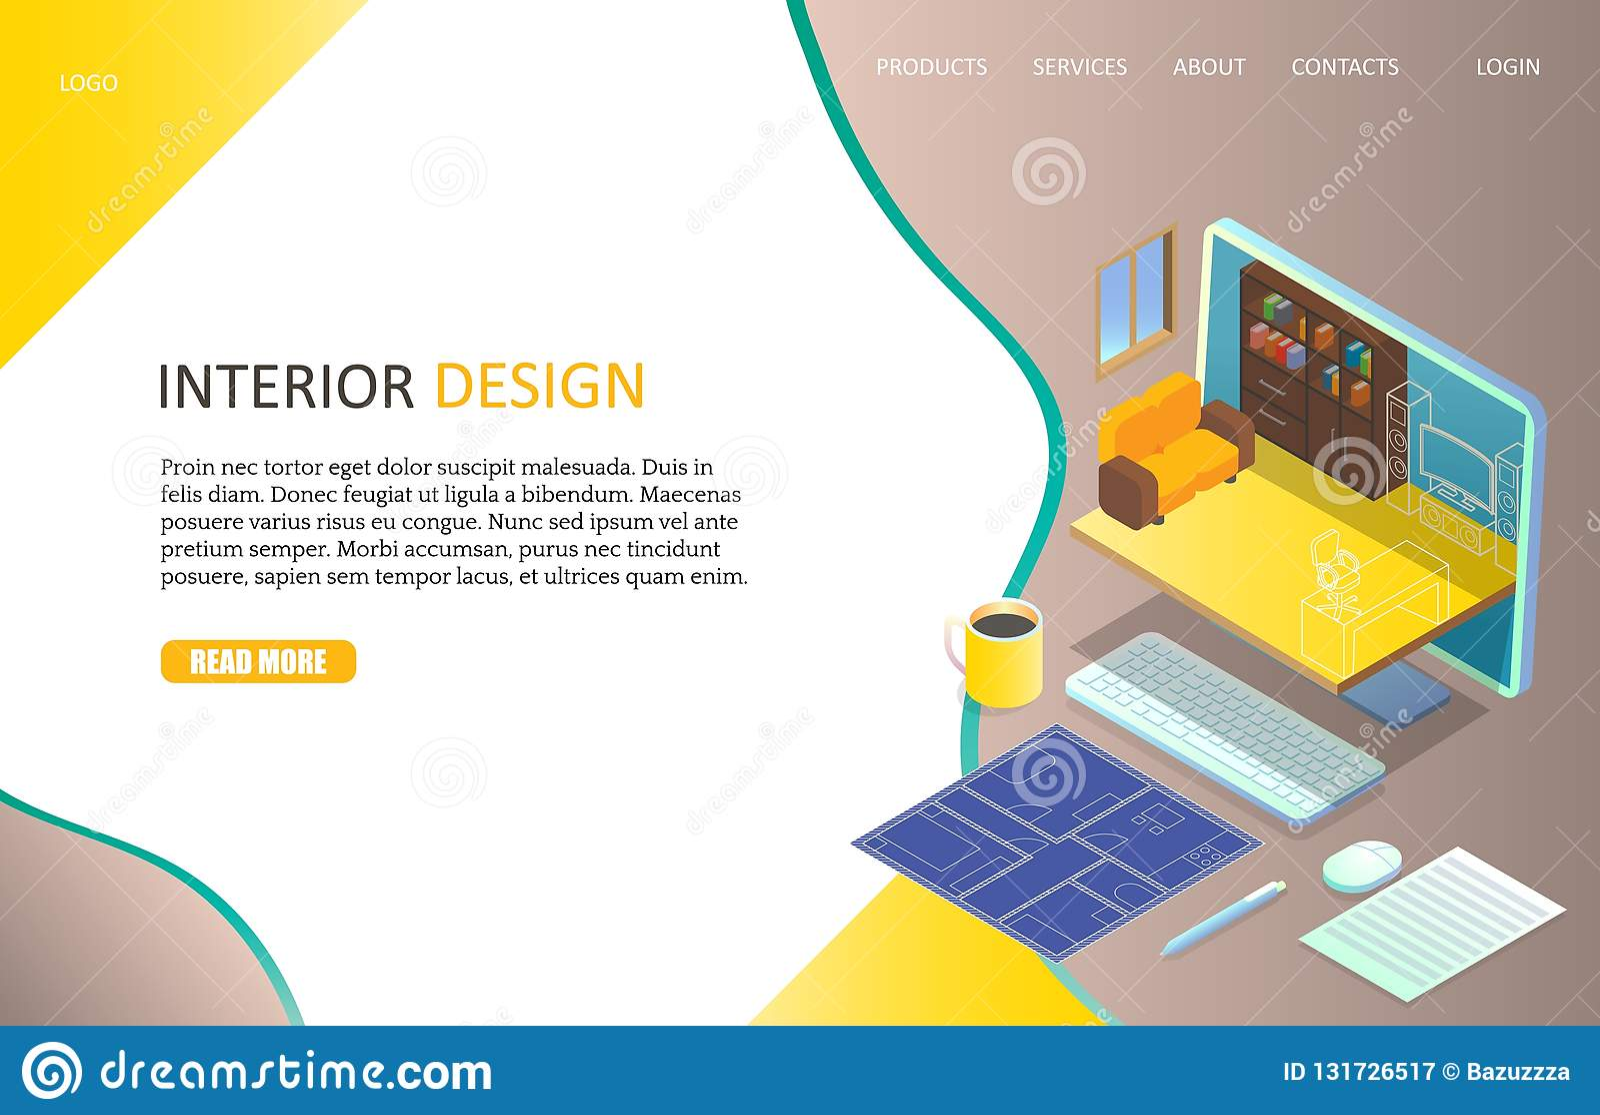 Online Interior Design Europe